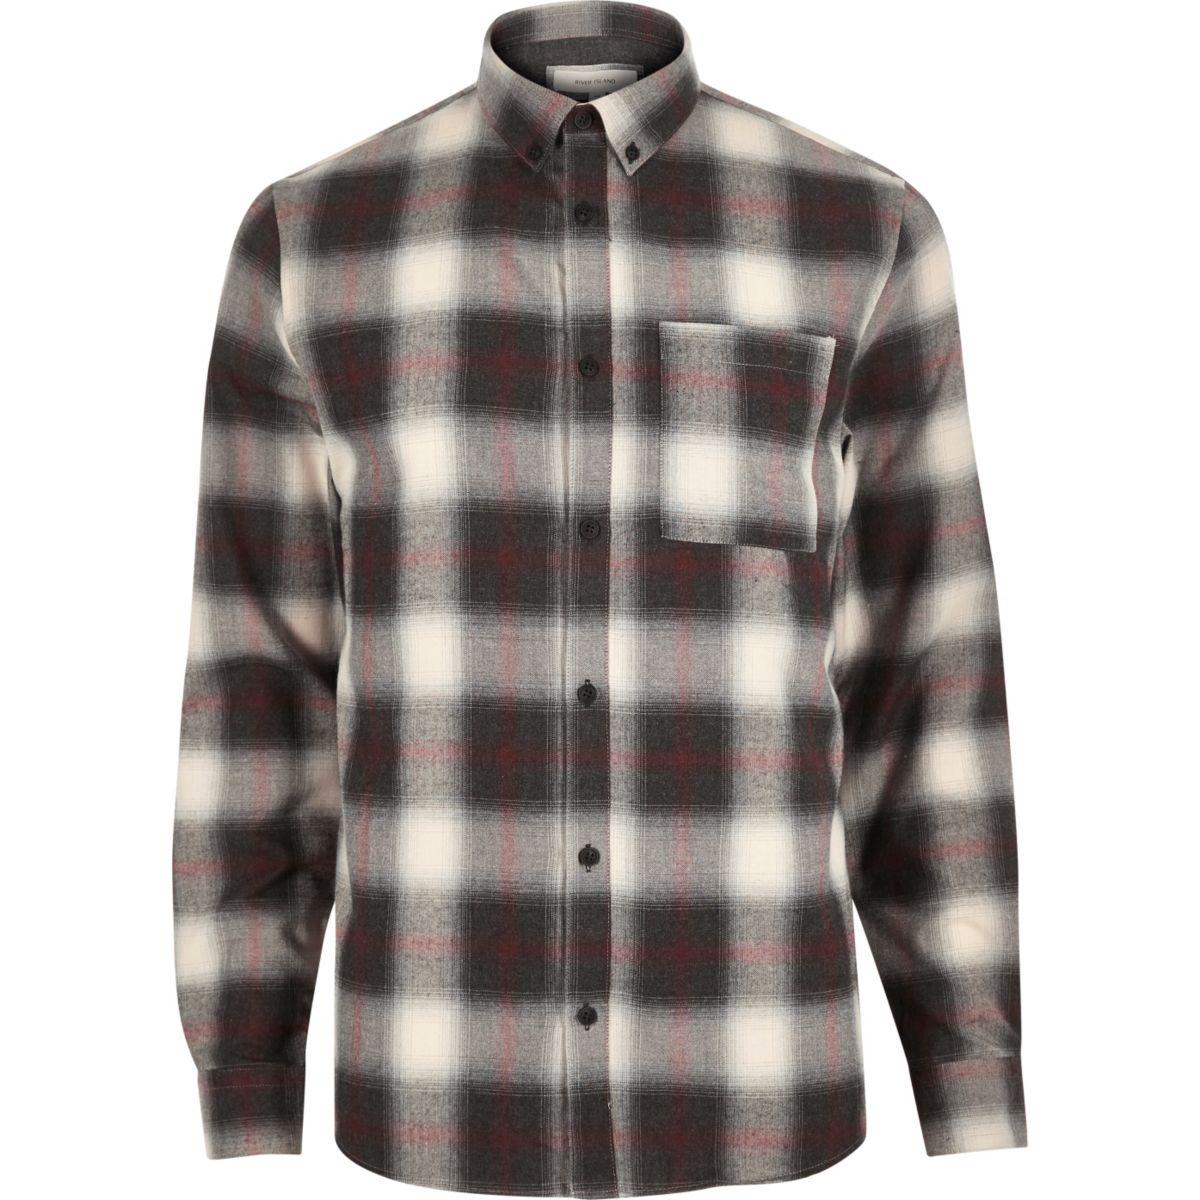 Ecru check flannel shirt